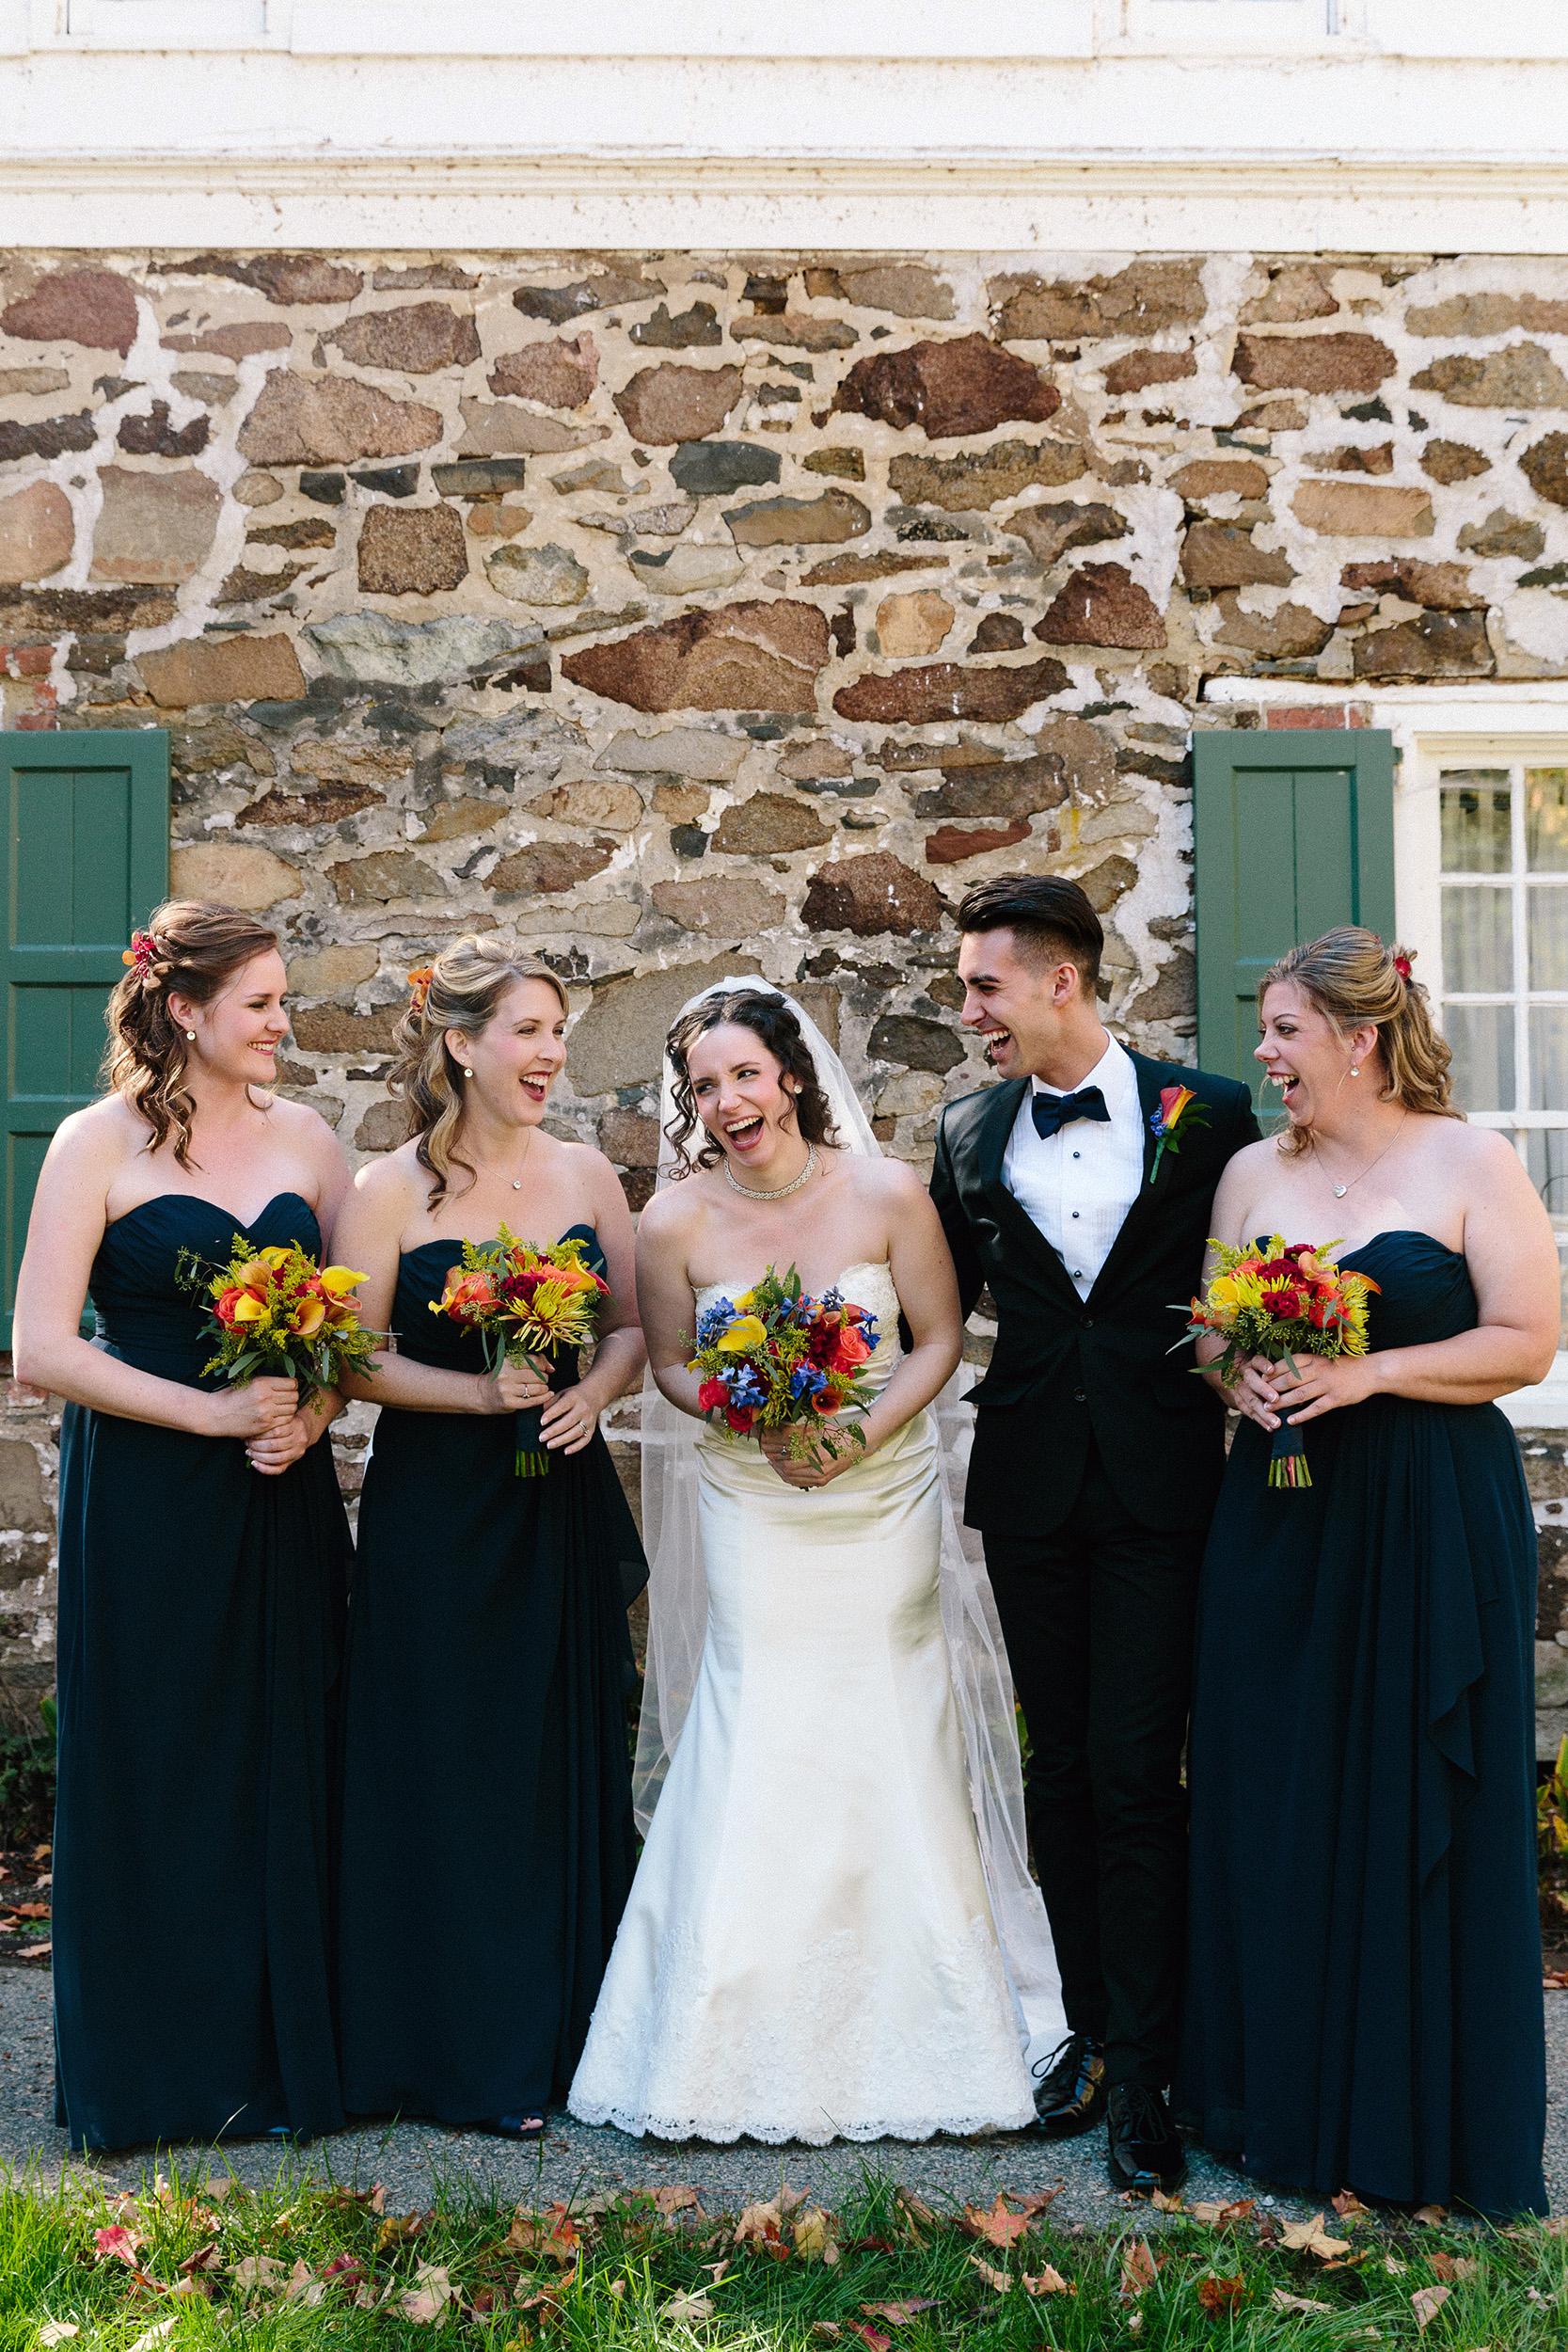 KarliCadel-Wedding-SarahEric-9617.jpg